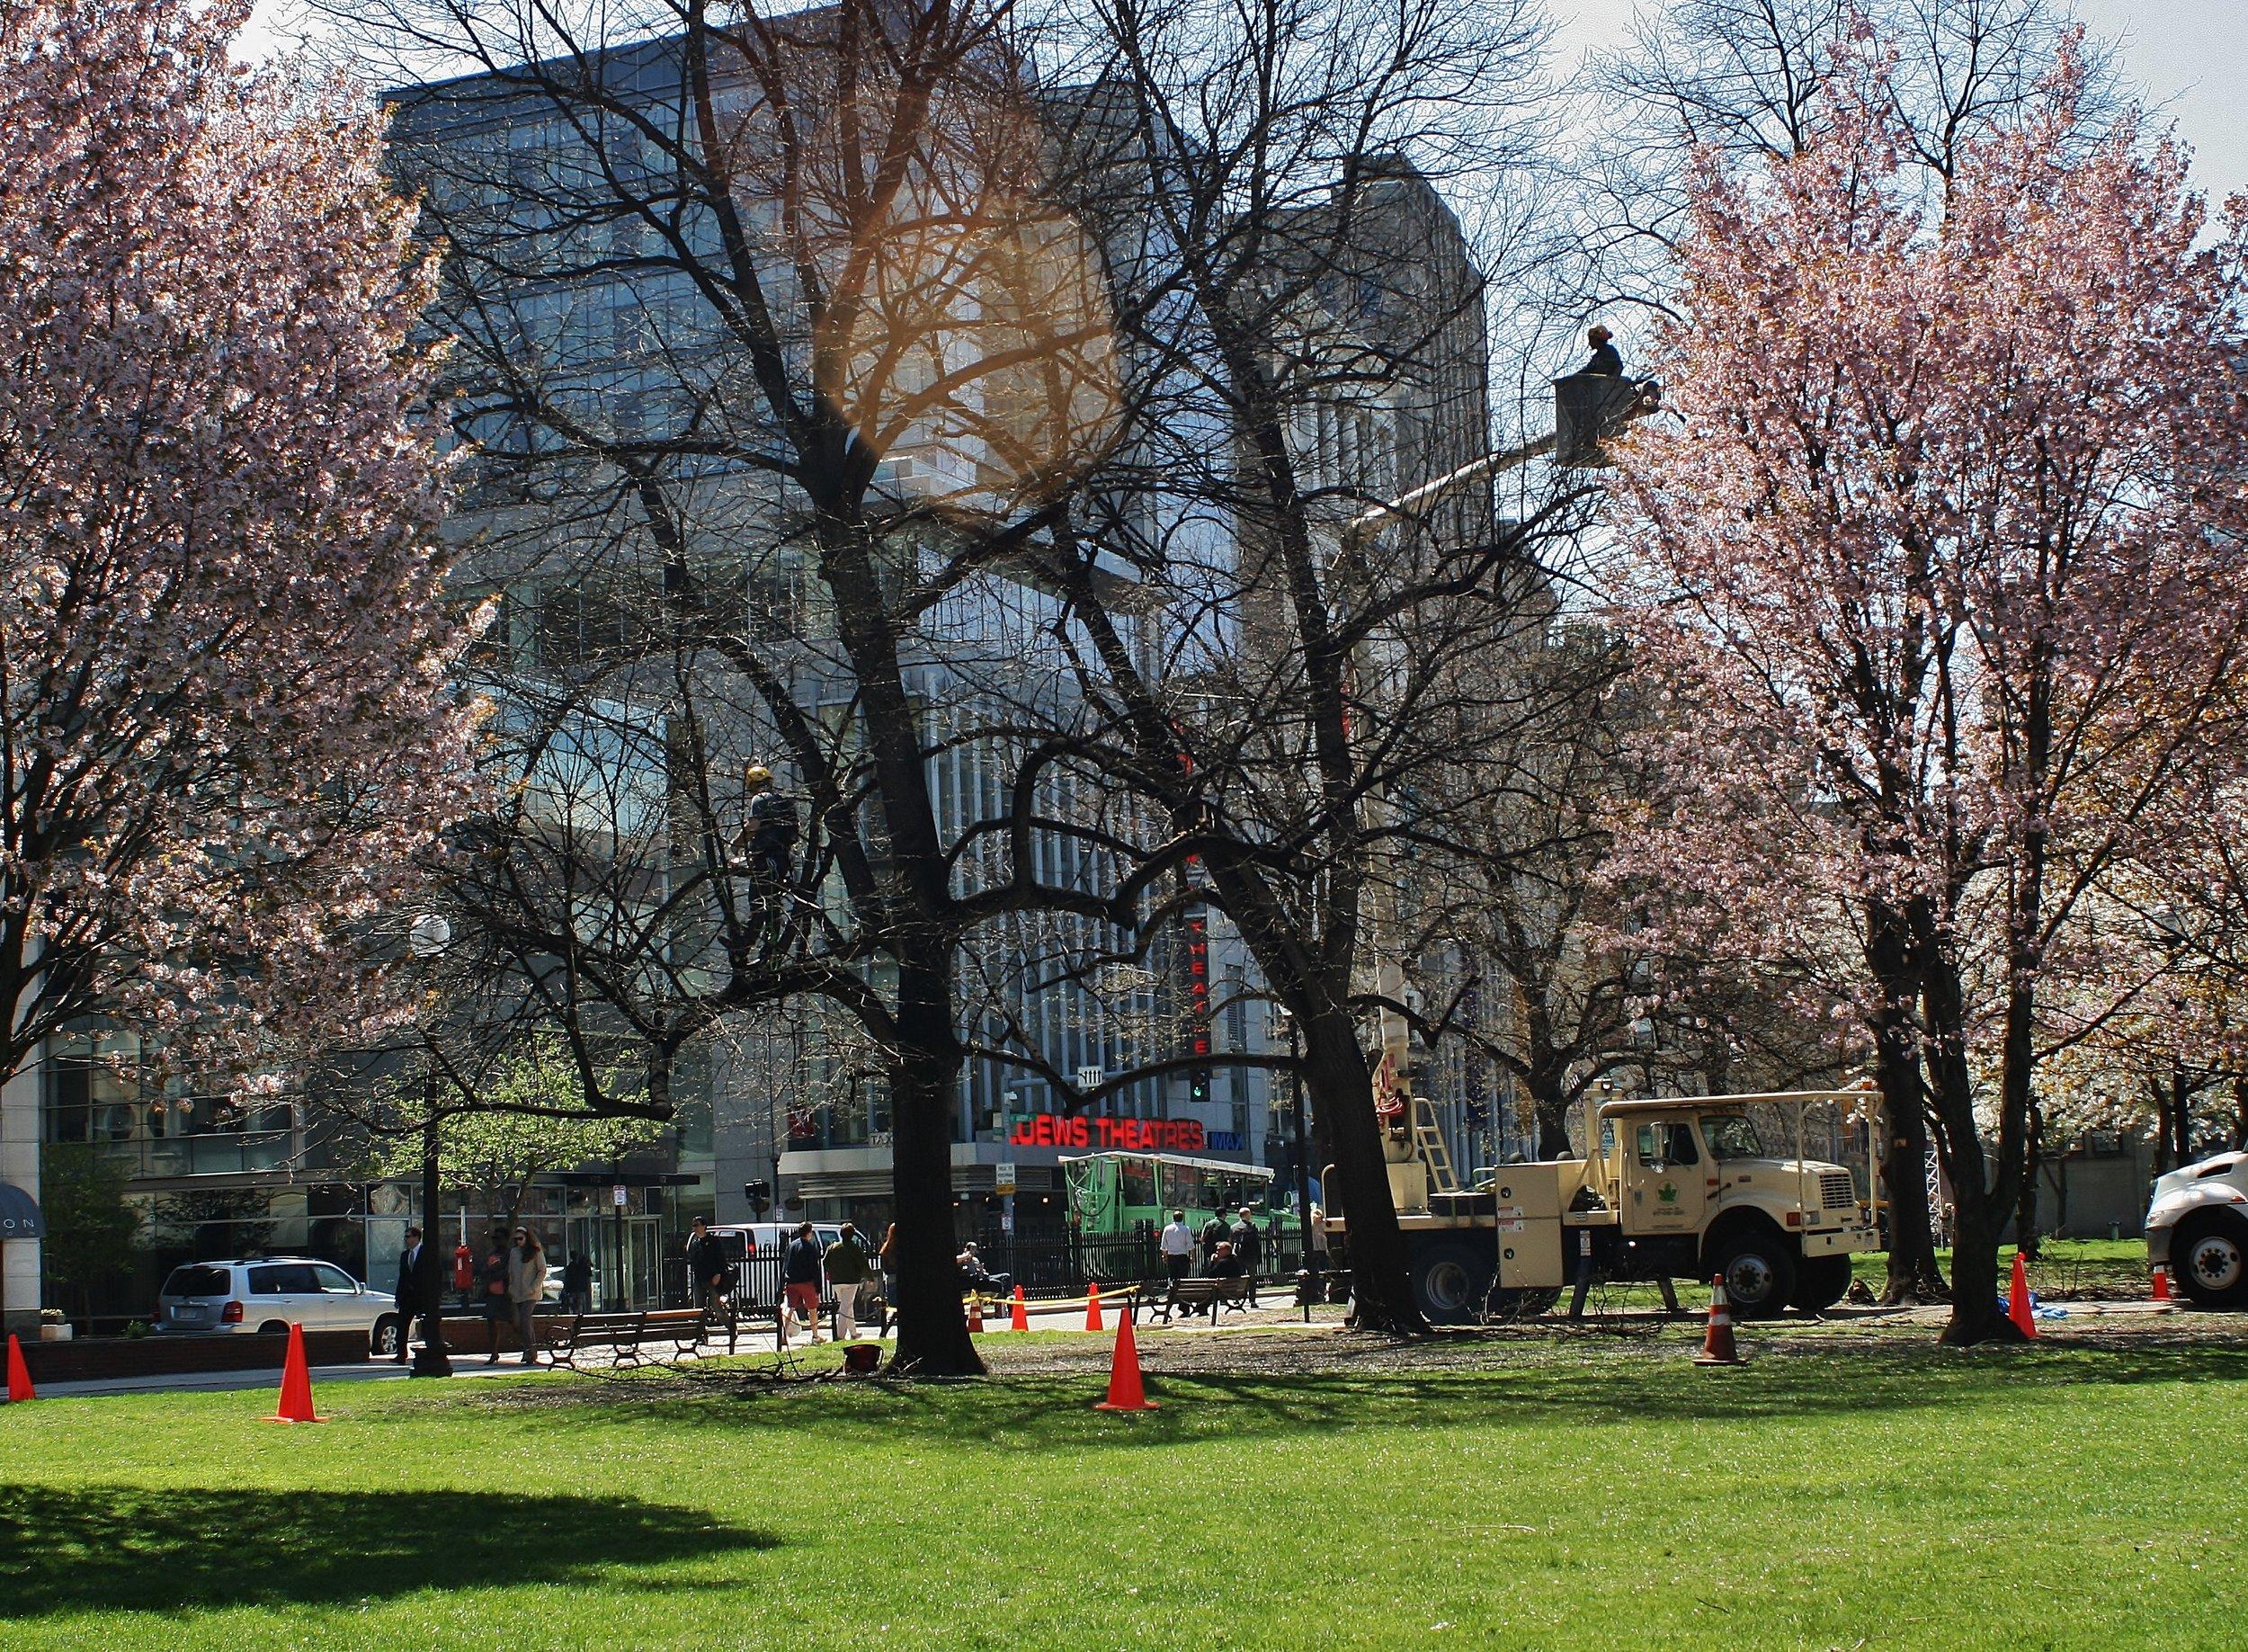 BTSE arborists providing needed tree care services at Boston Common.